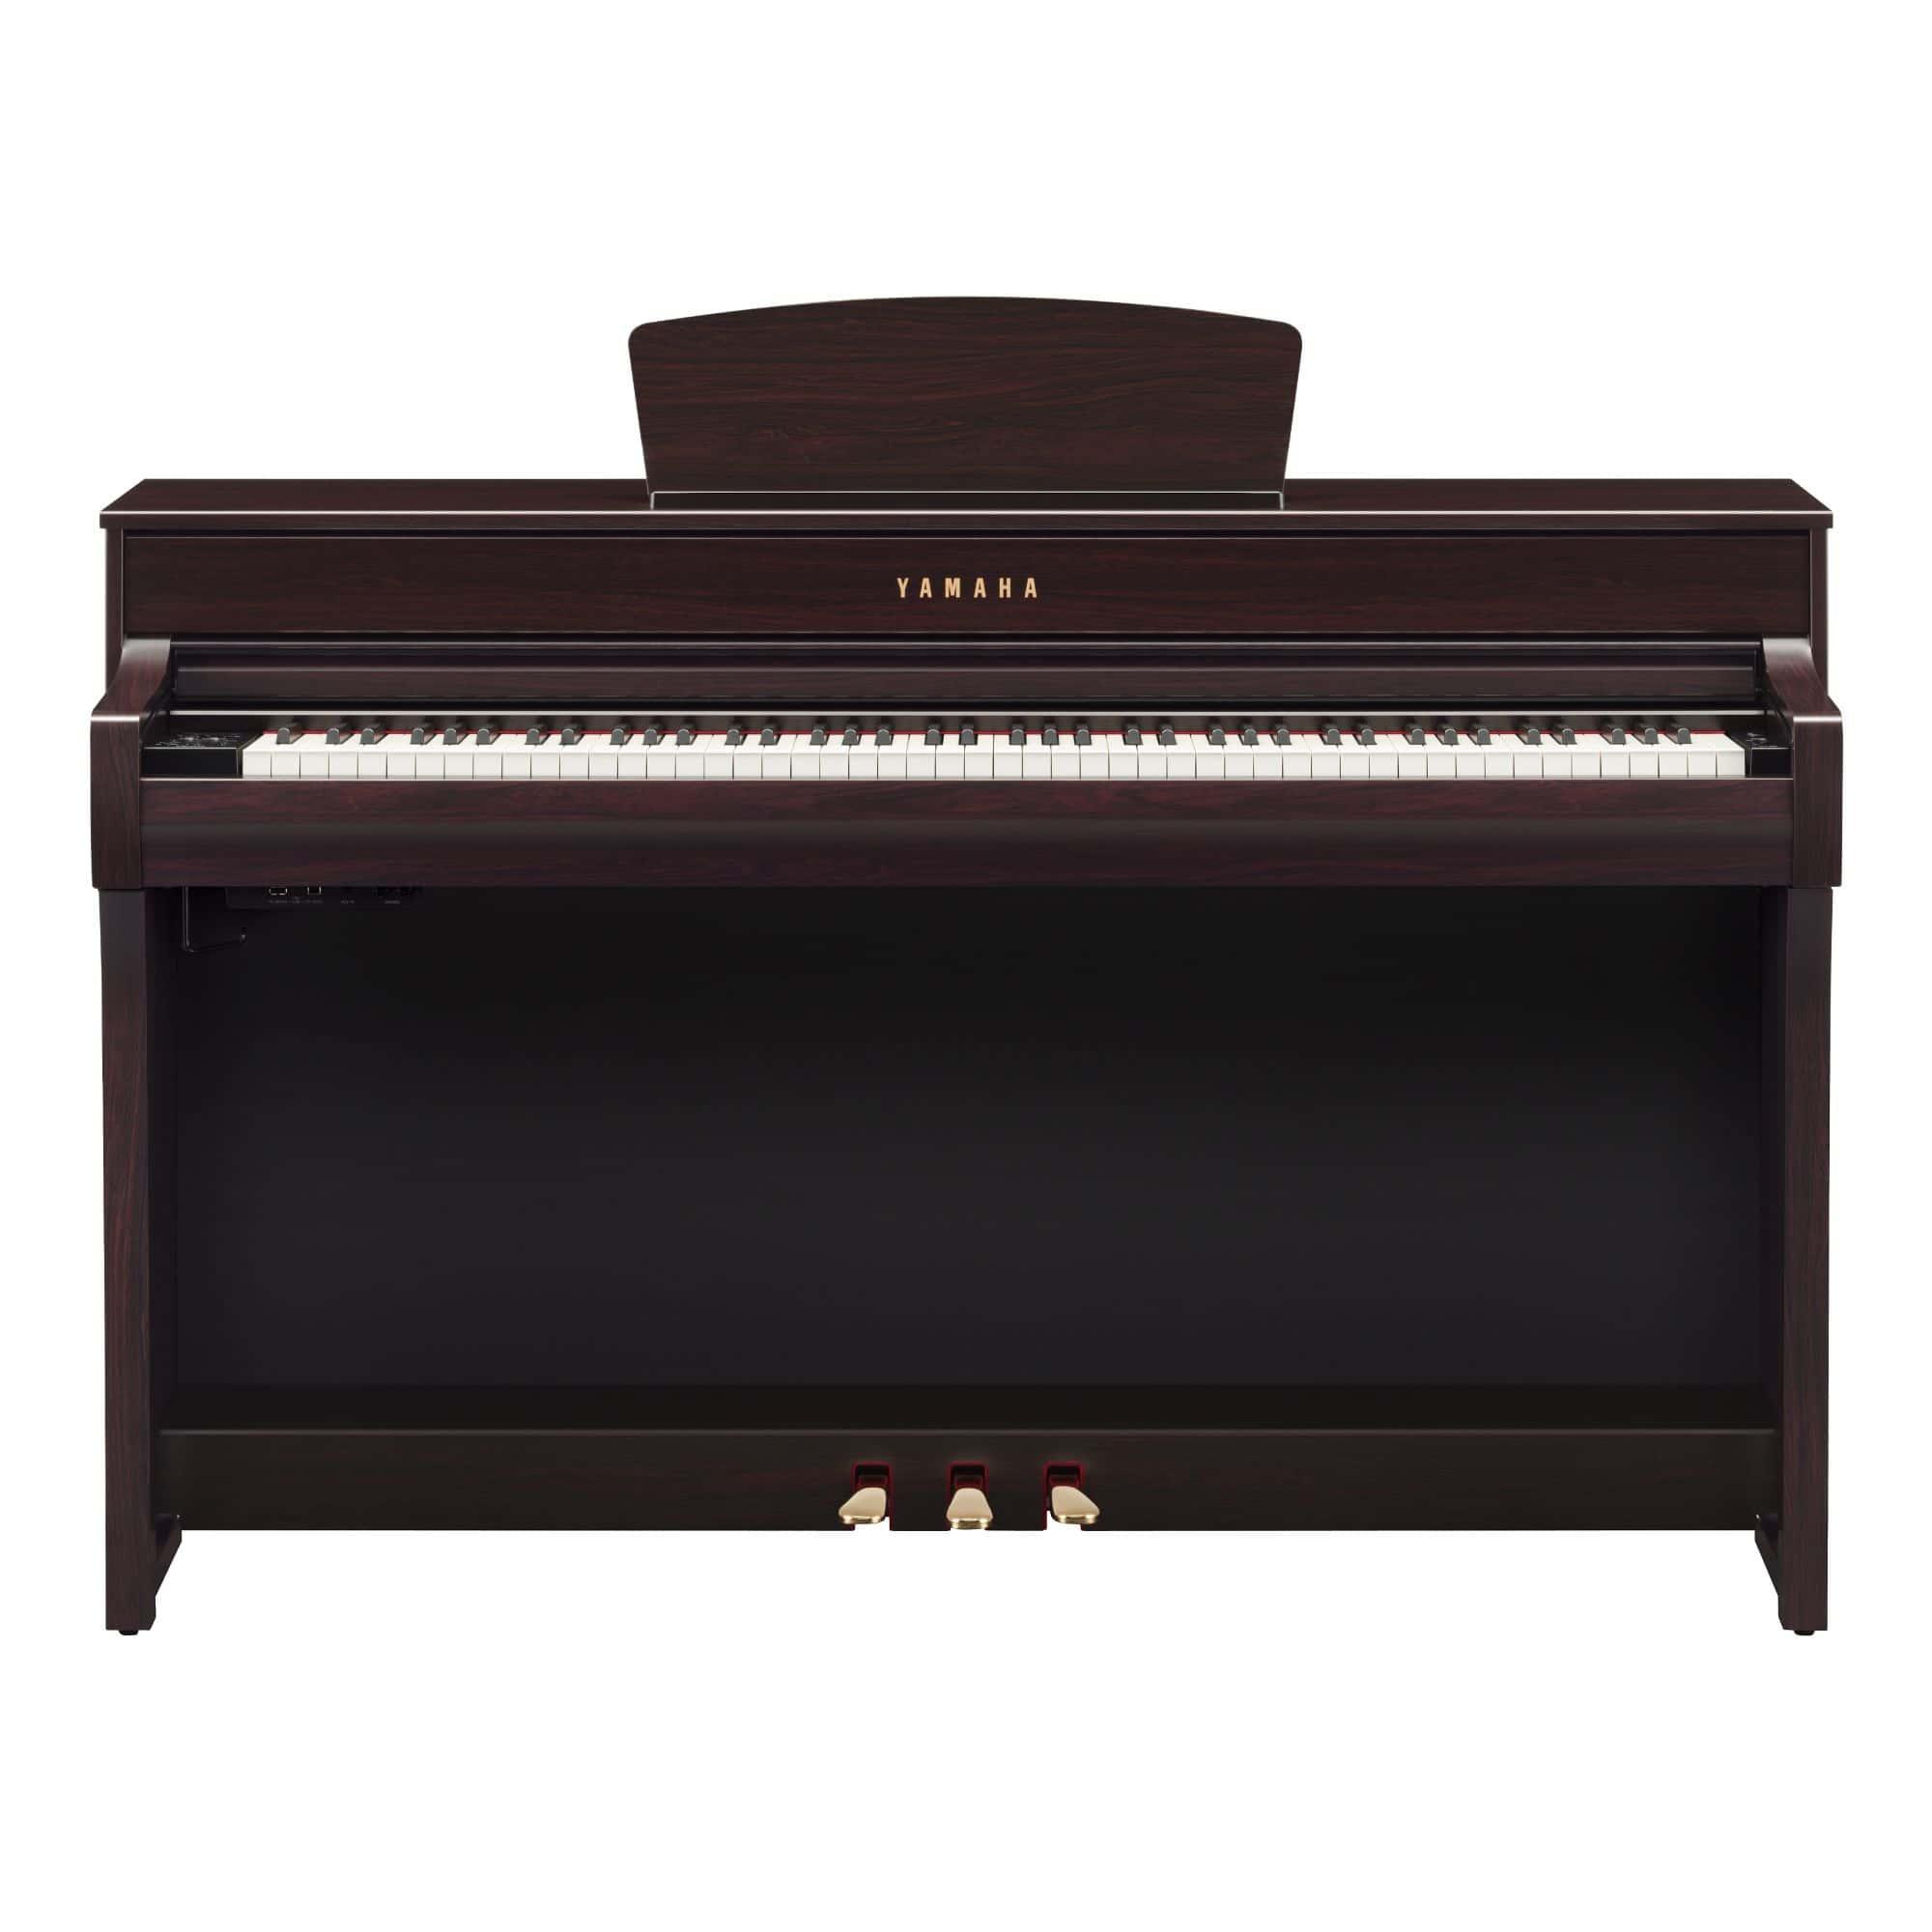 خرید                                     پیانو دیجیتال یاماها مدل CLP-735